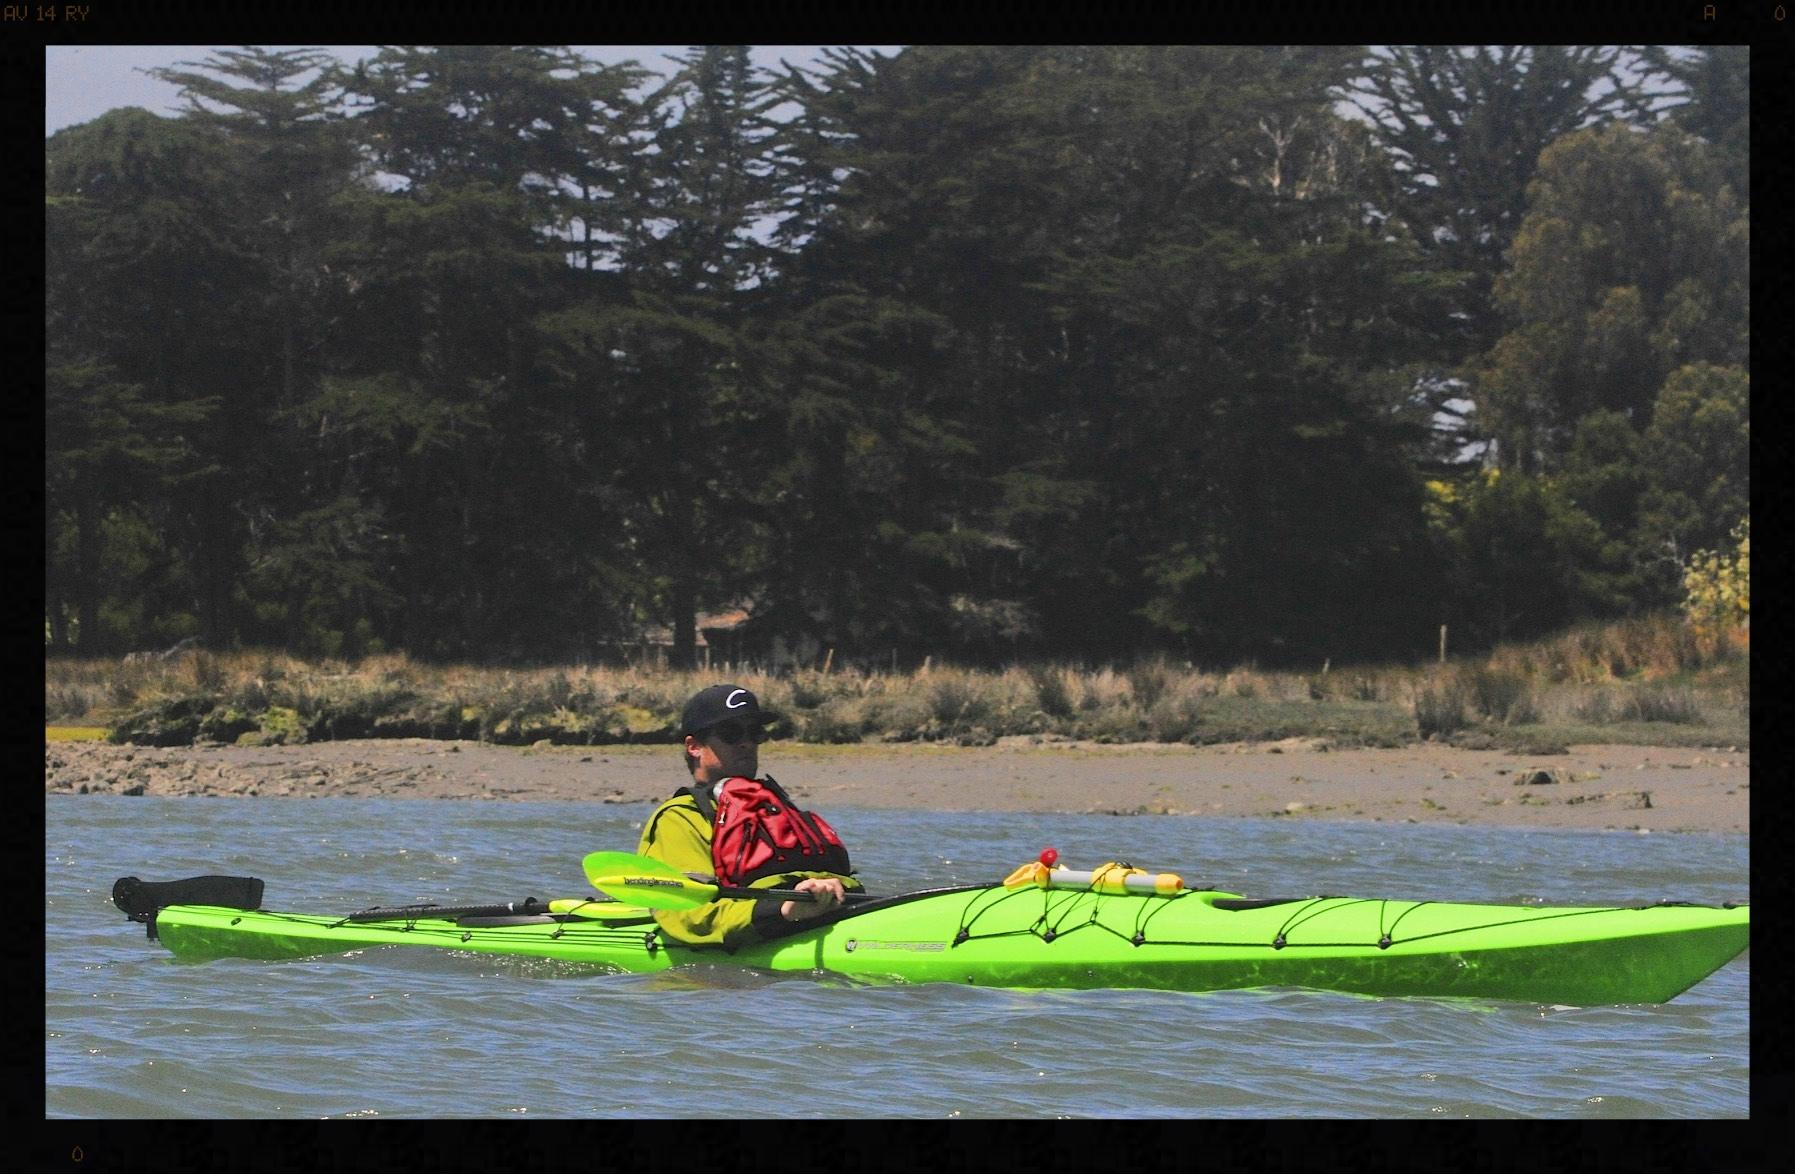 Crusing in Humboldt Bay